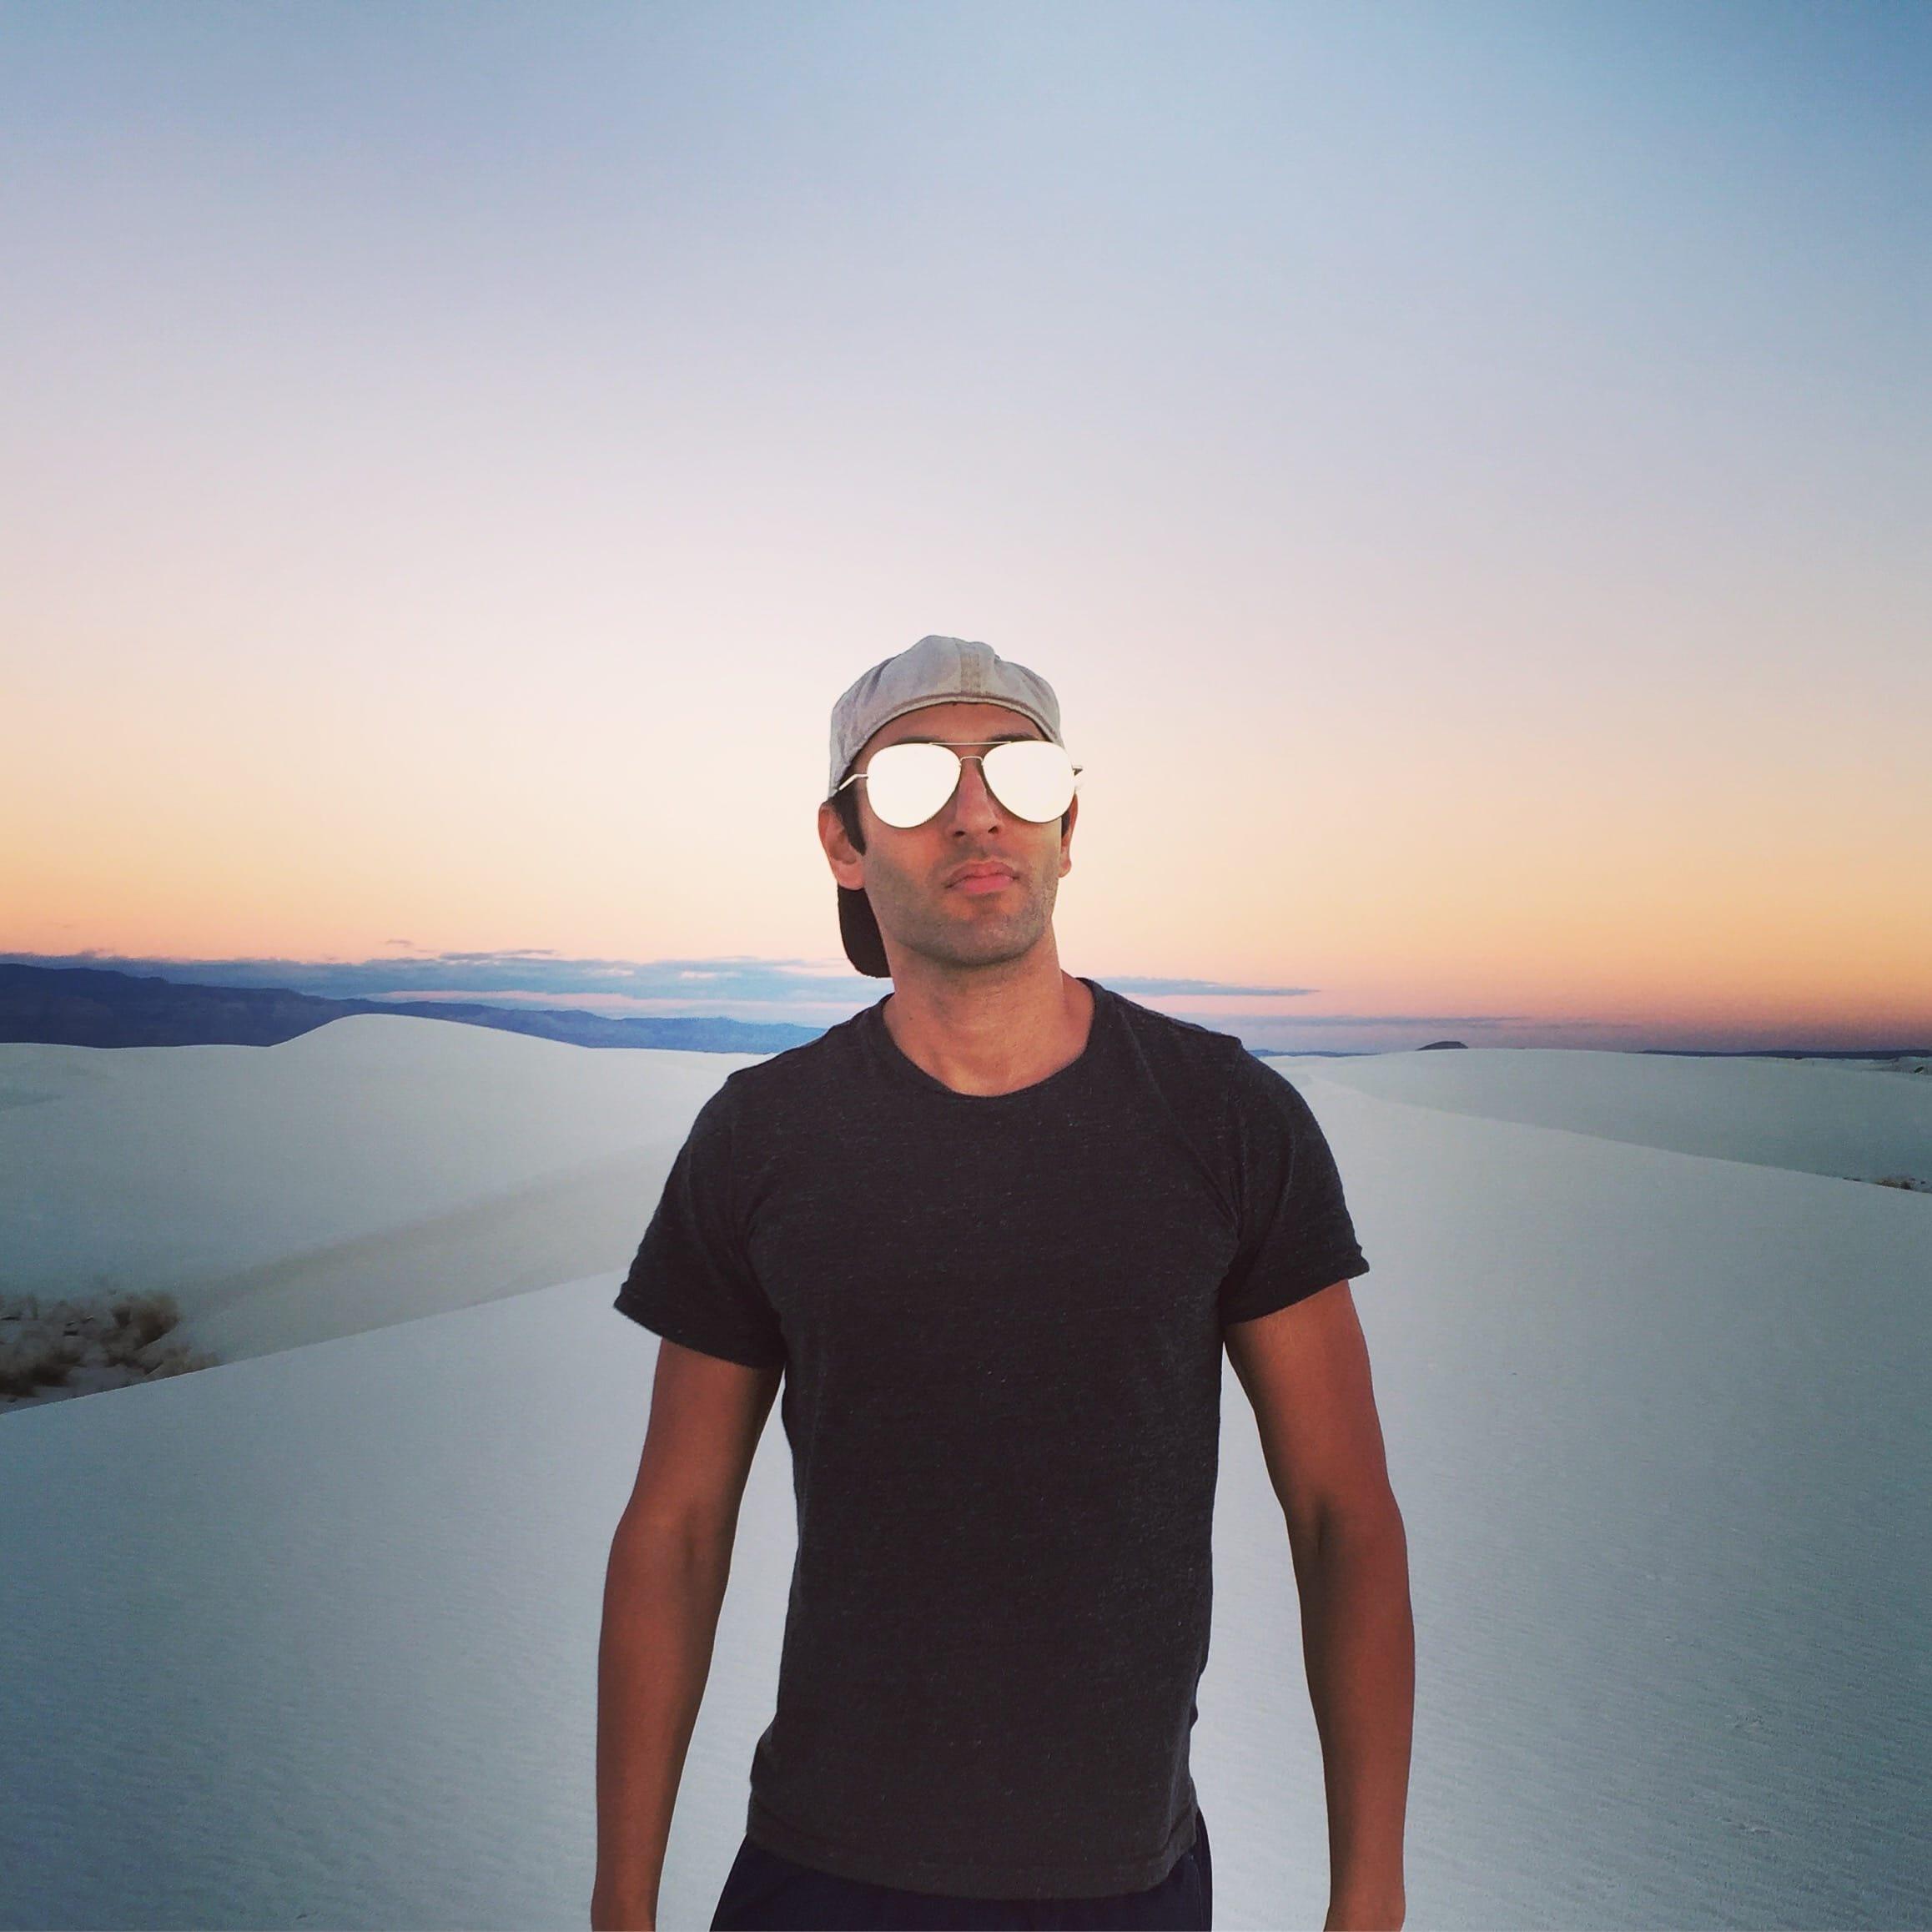 Chris Vij standing on white sand beach